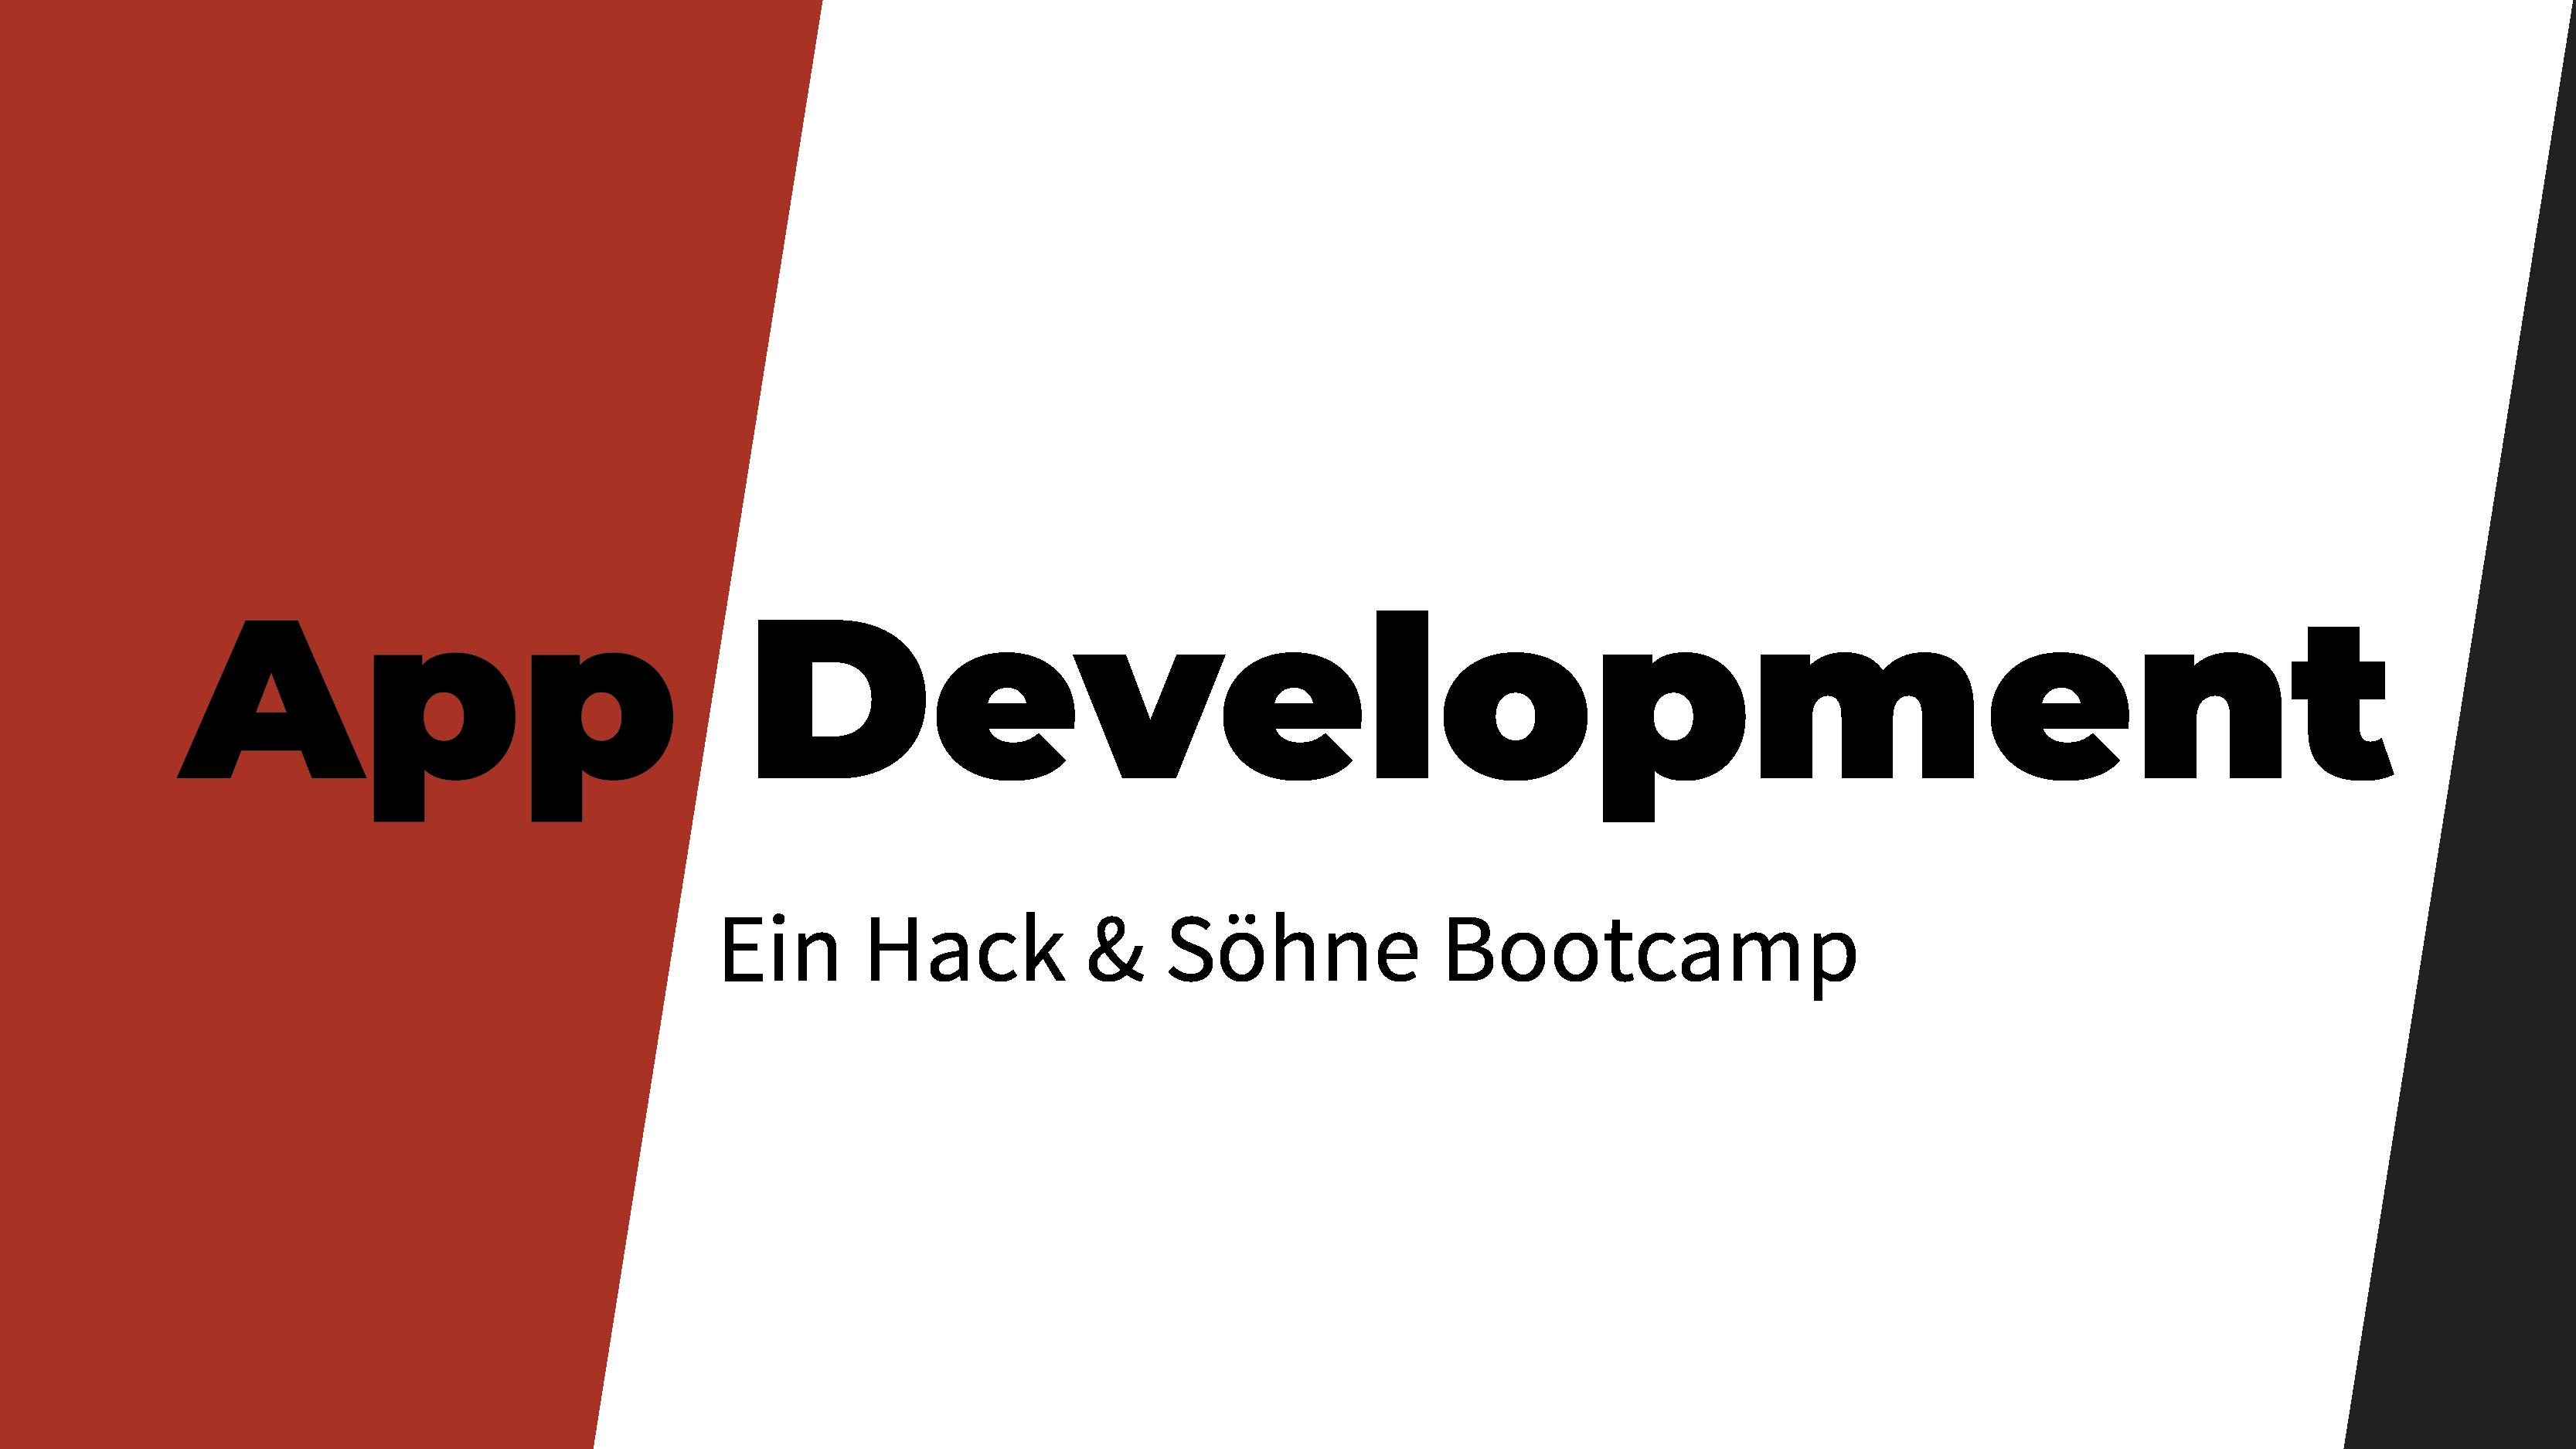 App Development Bootcamp